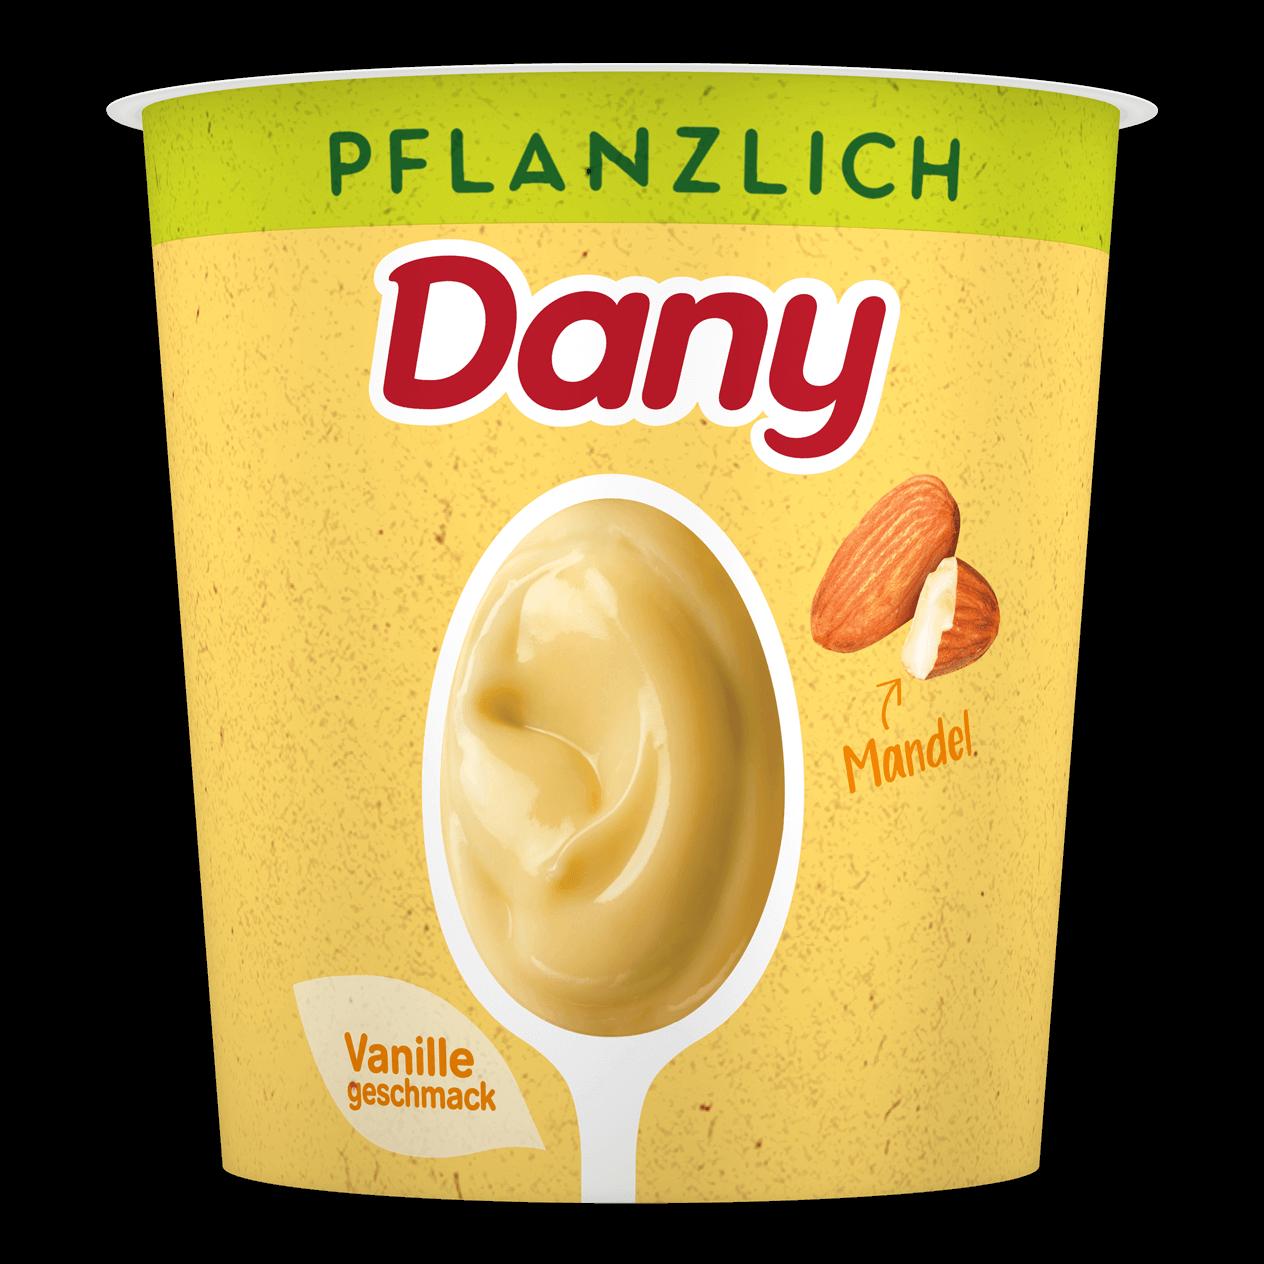 Dany Pflanzlich Vanillegeschmack Mandel